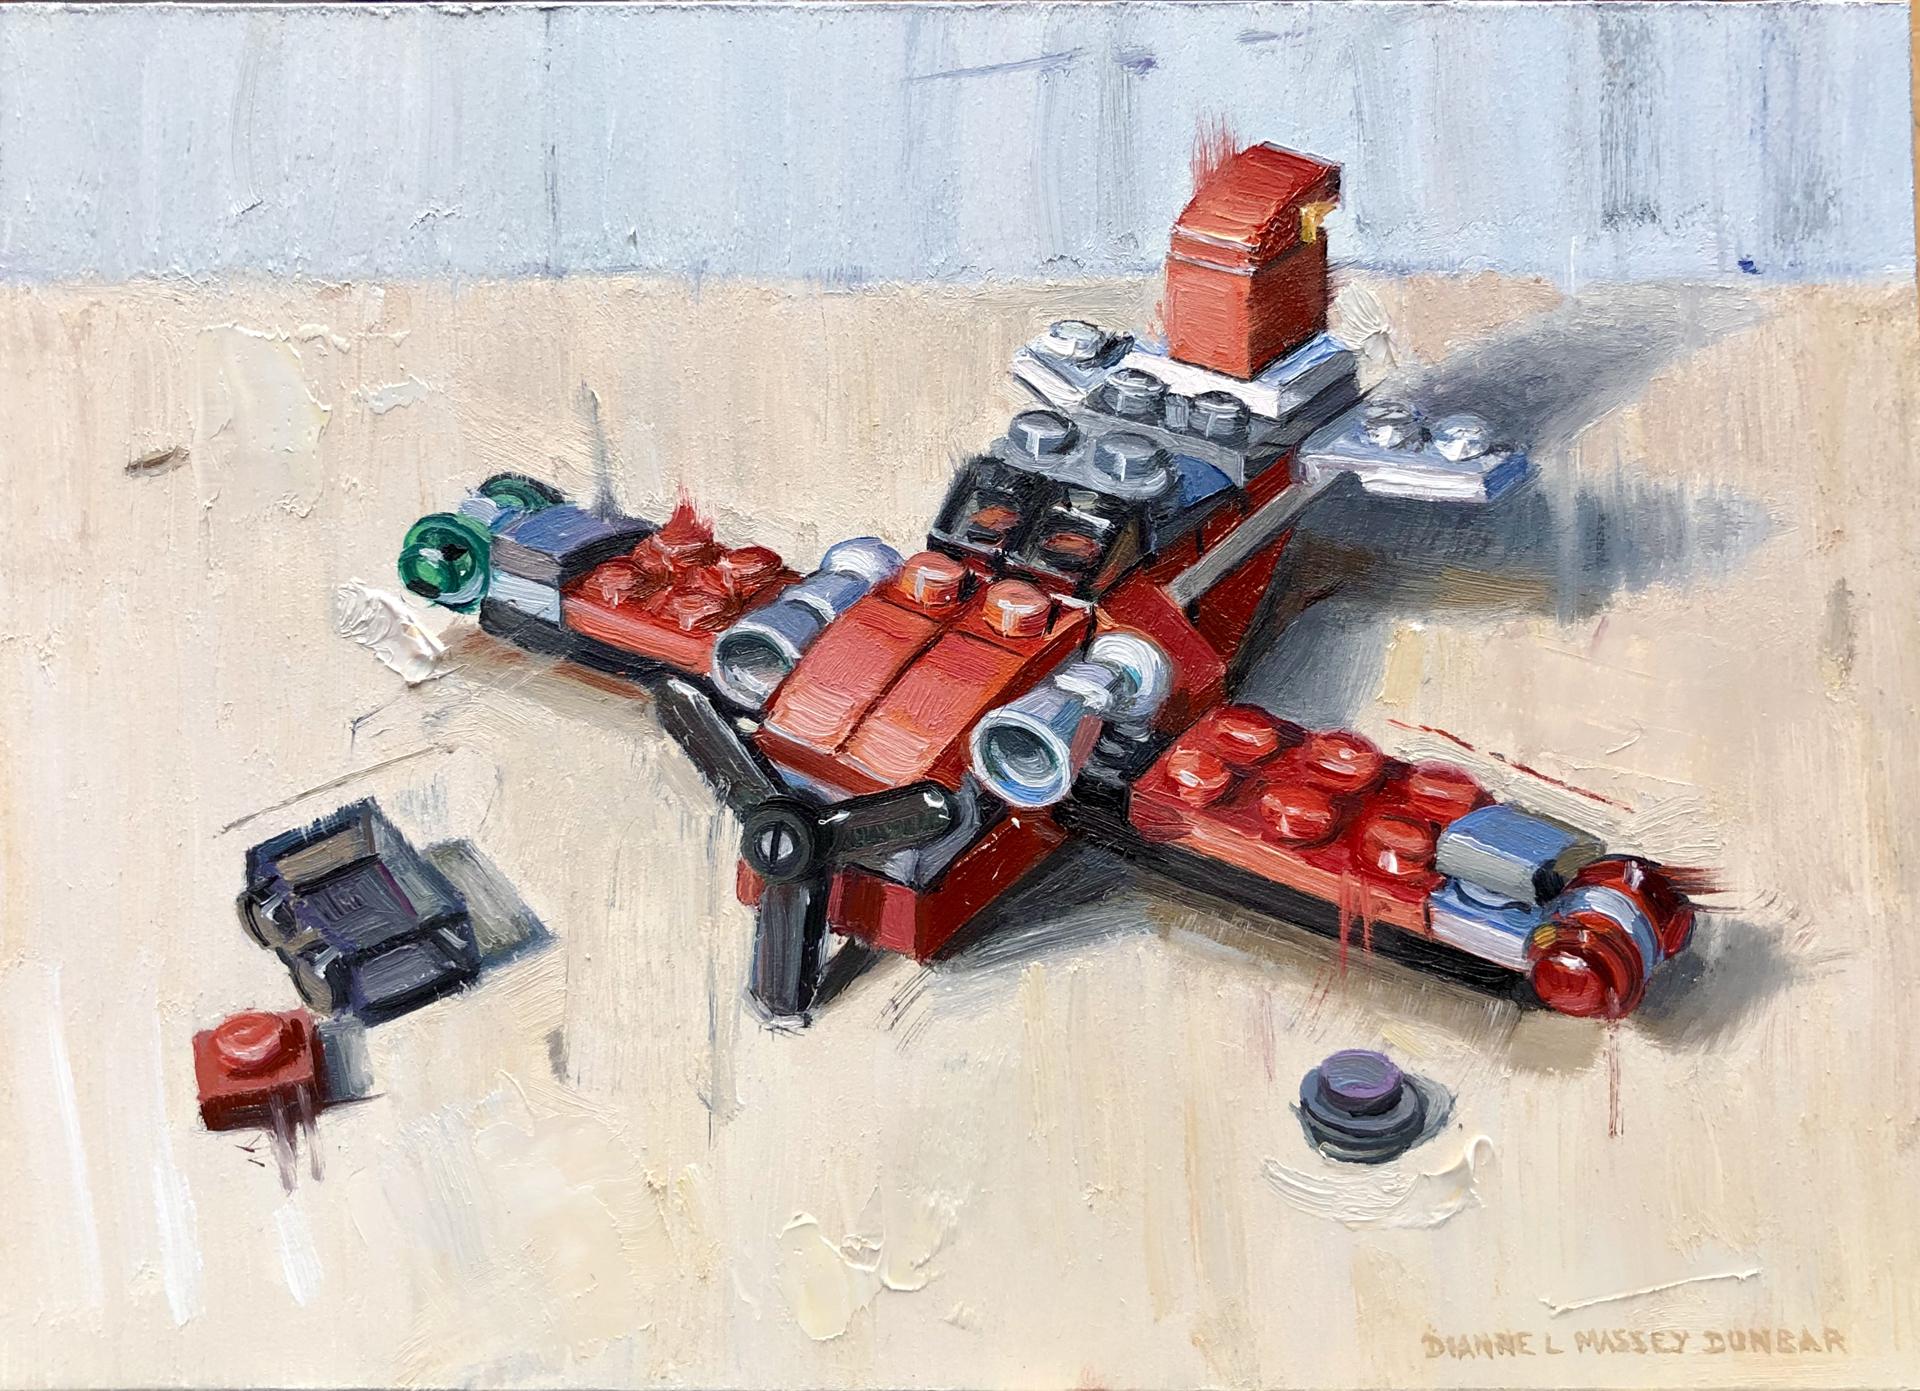 Red Plane by Dianne L Massey Dunbar